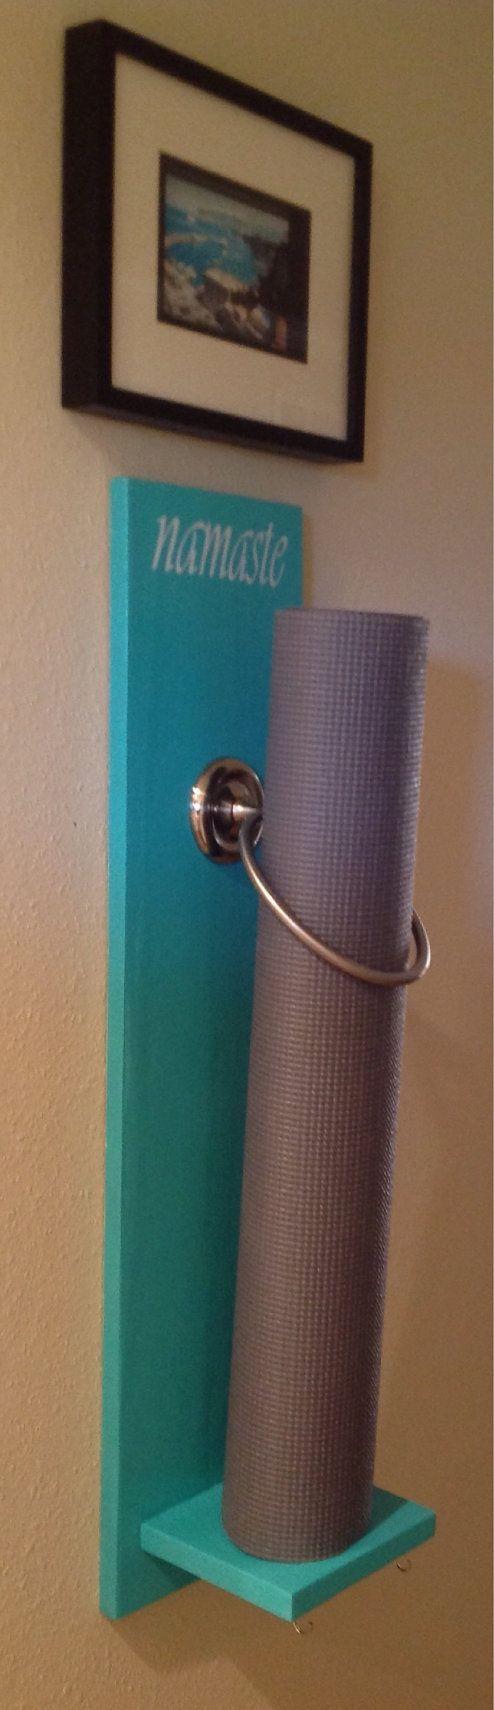 Yoga post on Yoga Mat Holder Yoga Blocks Handmade Yoga Mat Wall by MoodieArt